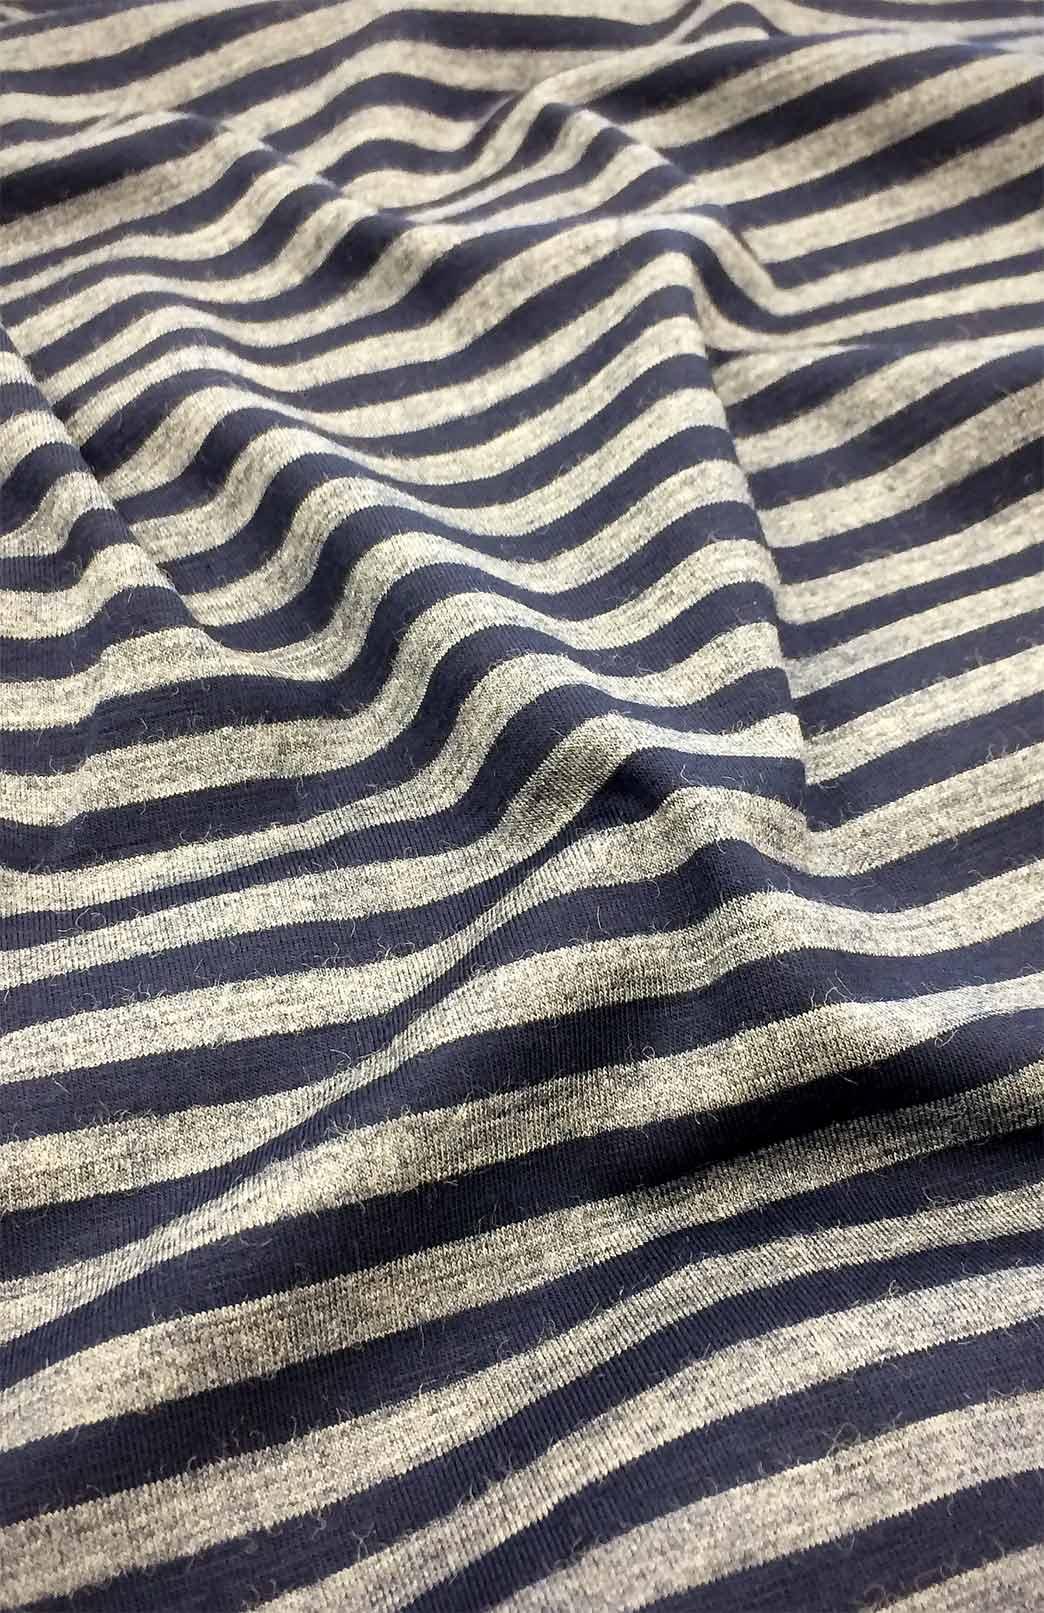 Ellie Dress - Women's Blue and Grey Striped A-Line Swing Dress with 3/4 sleeves and Side Pockets - Smitten Merino Tasmania Australia